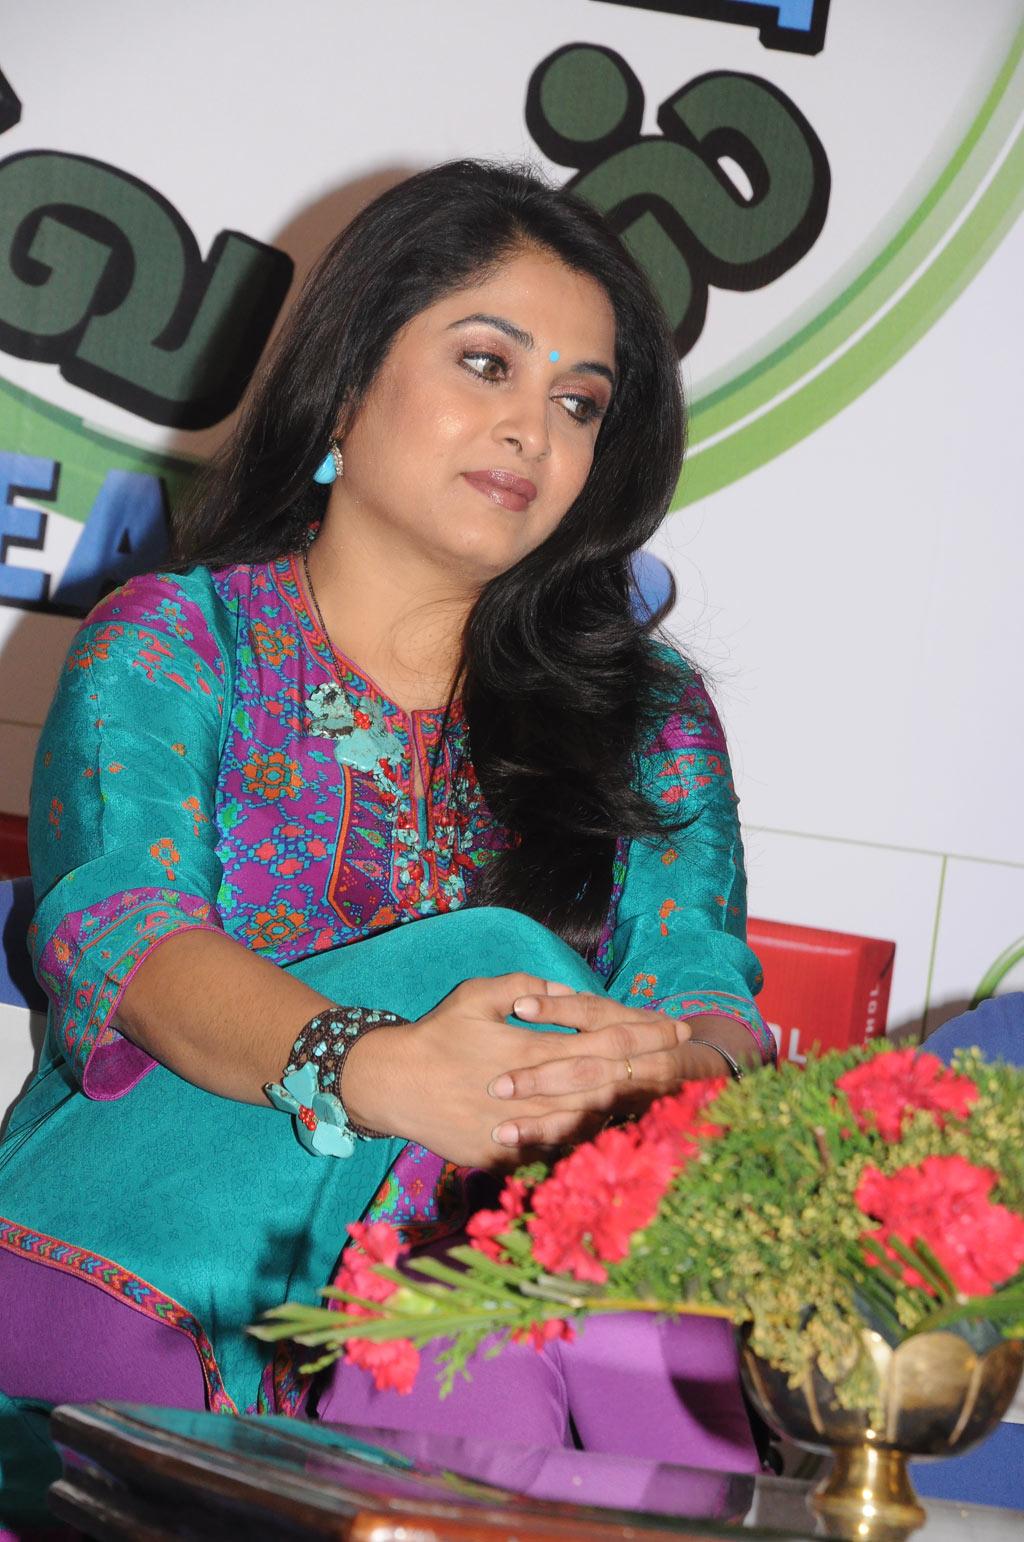 Ramya Krishnan in Churidar @ Cinthol Contest Photo Set - Actress ...